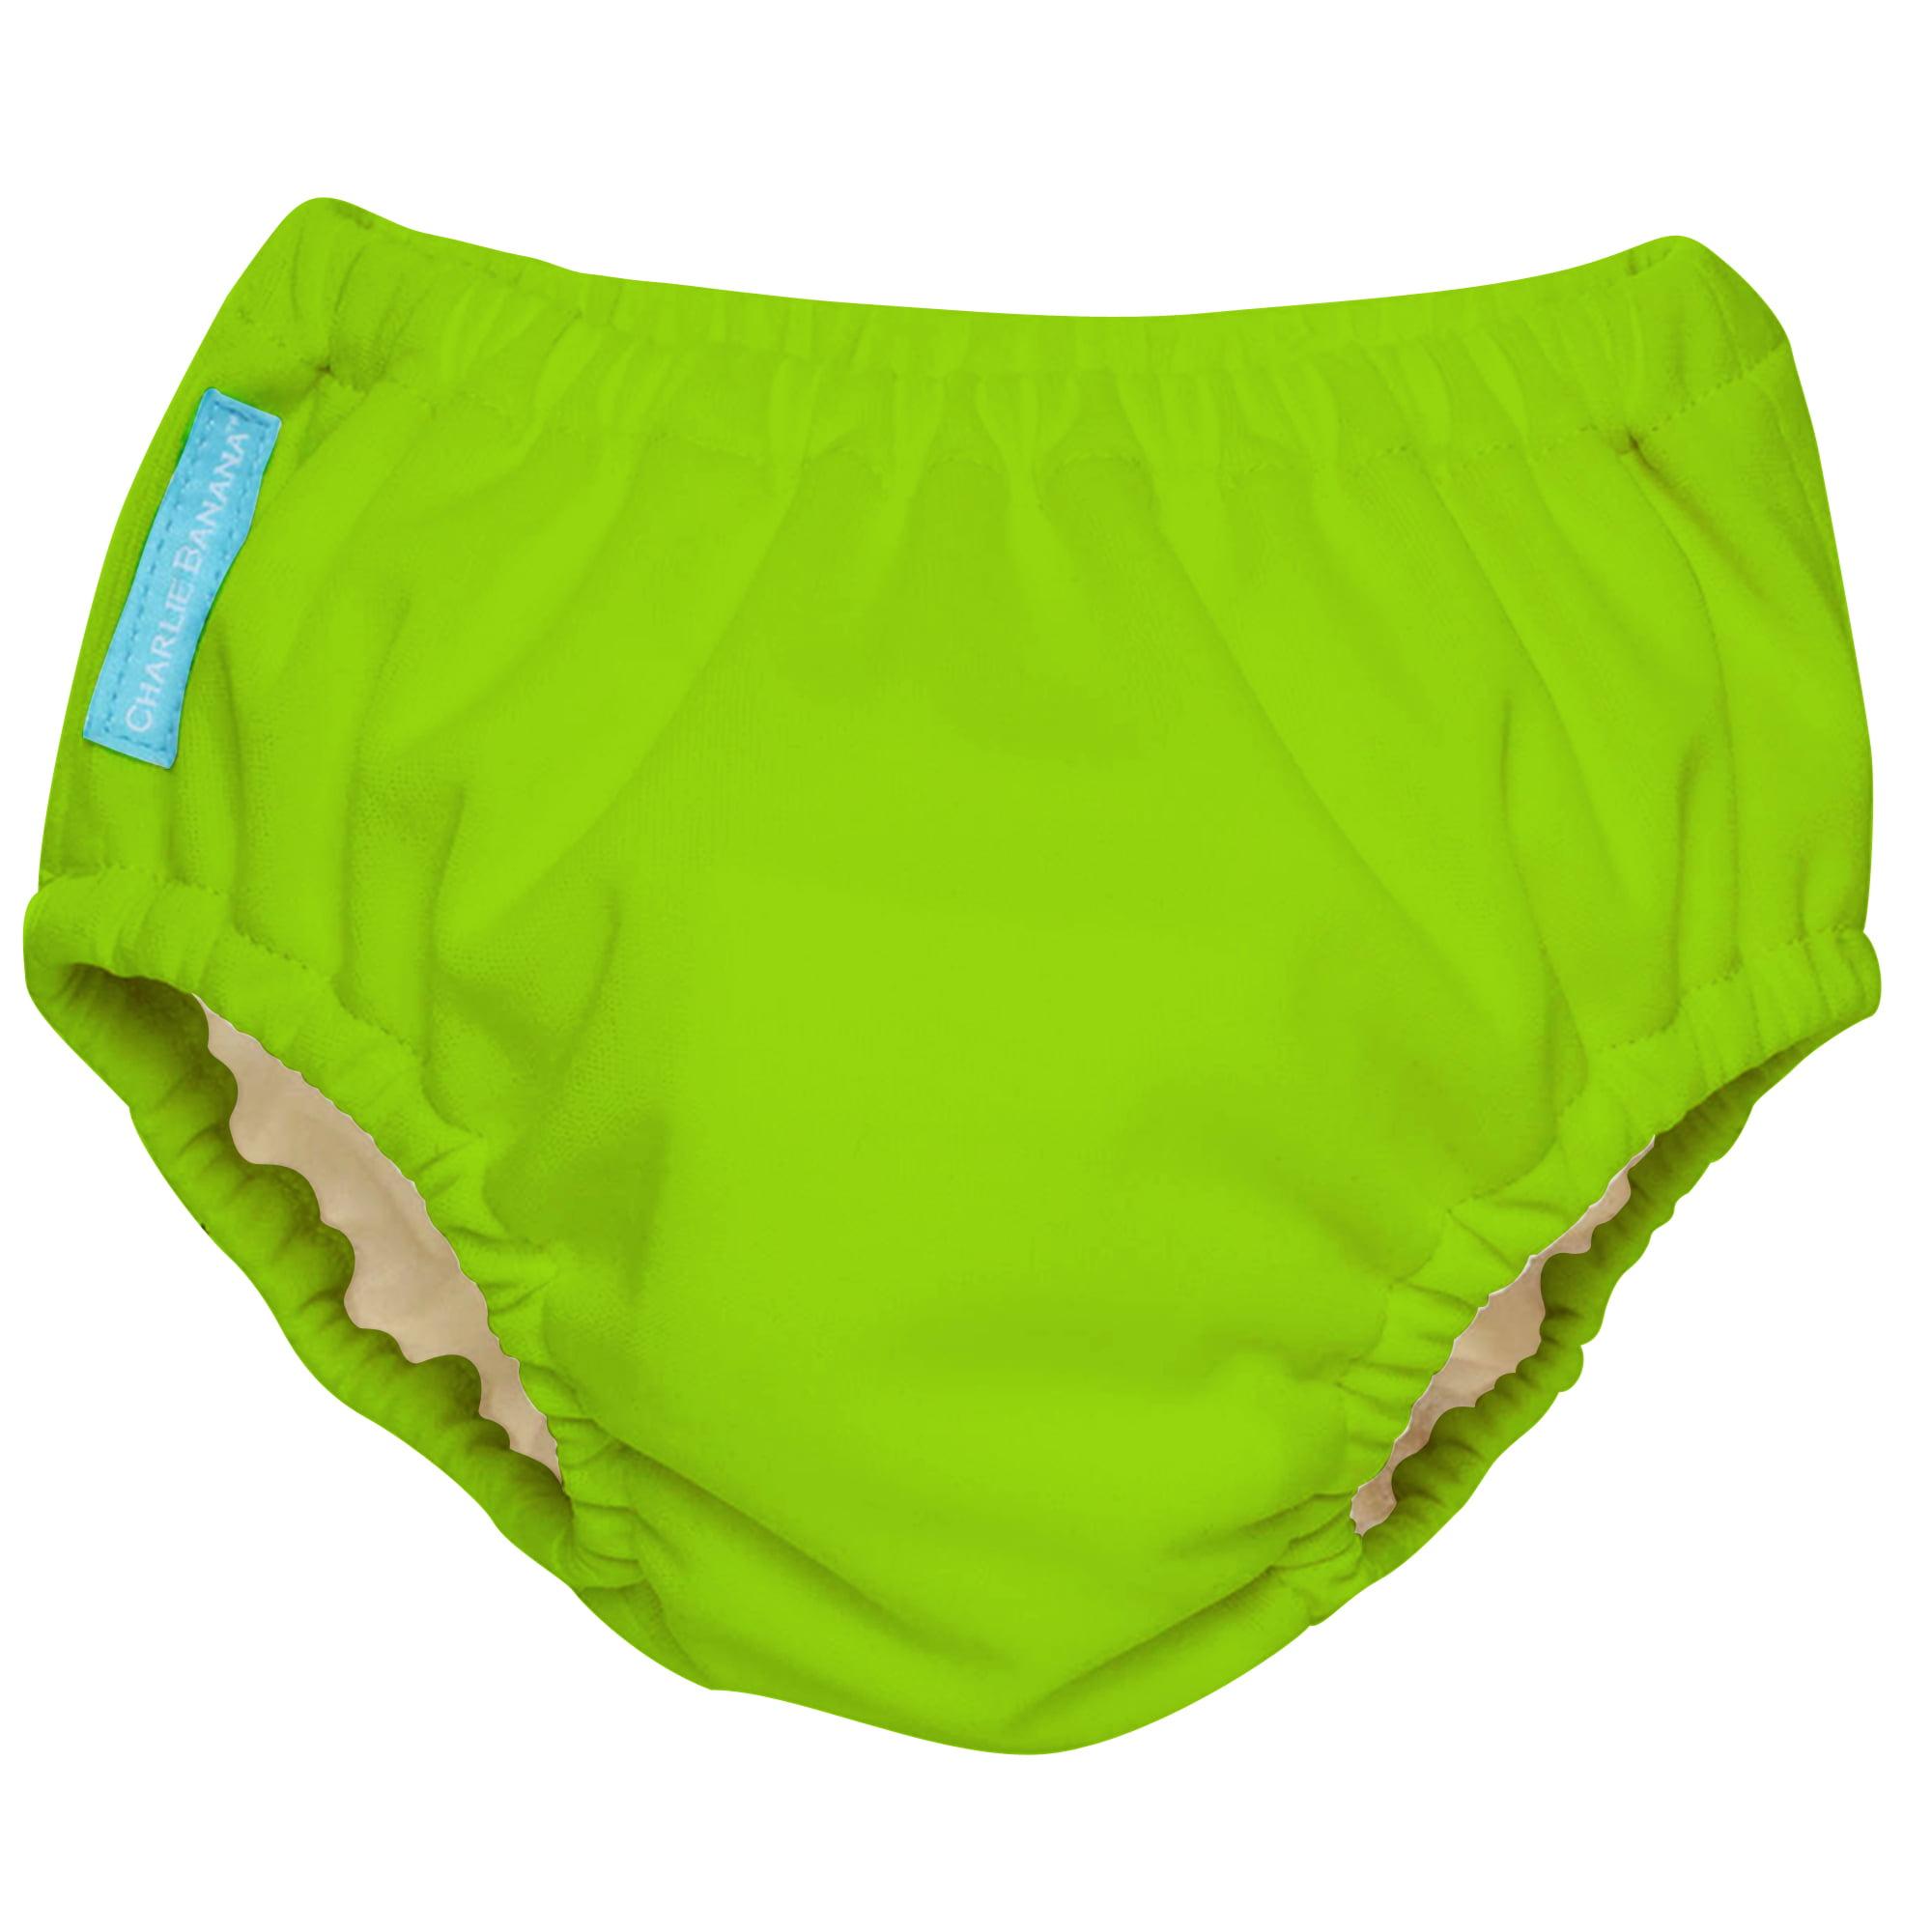 Charlie Banana Extraordinary Reusable Swim Diaper, Green (Choose Size)